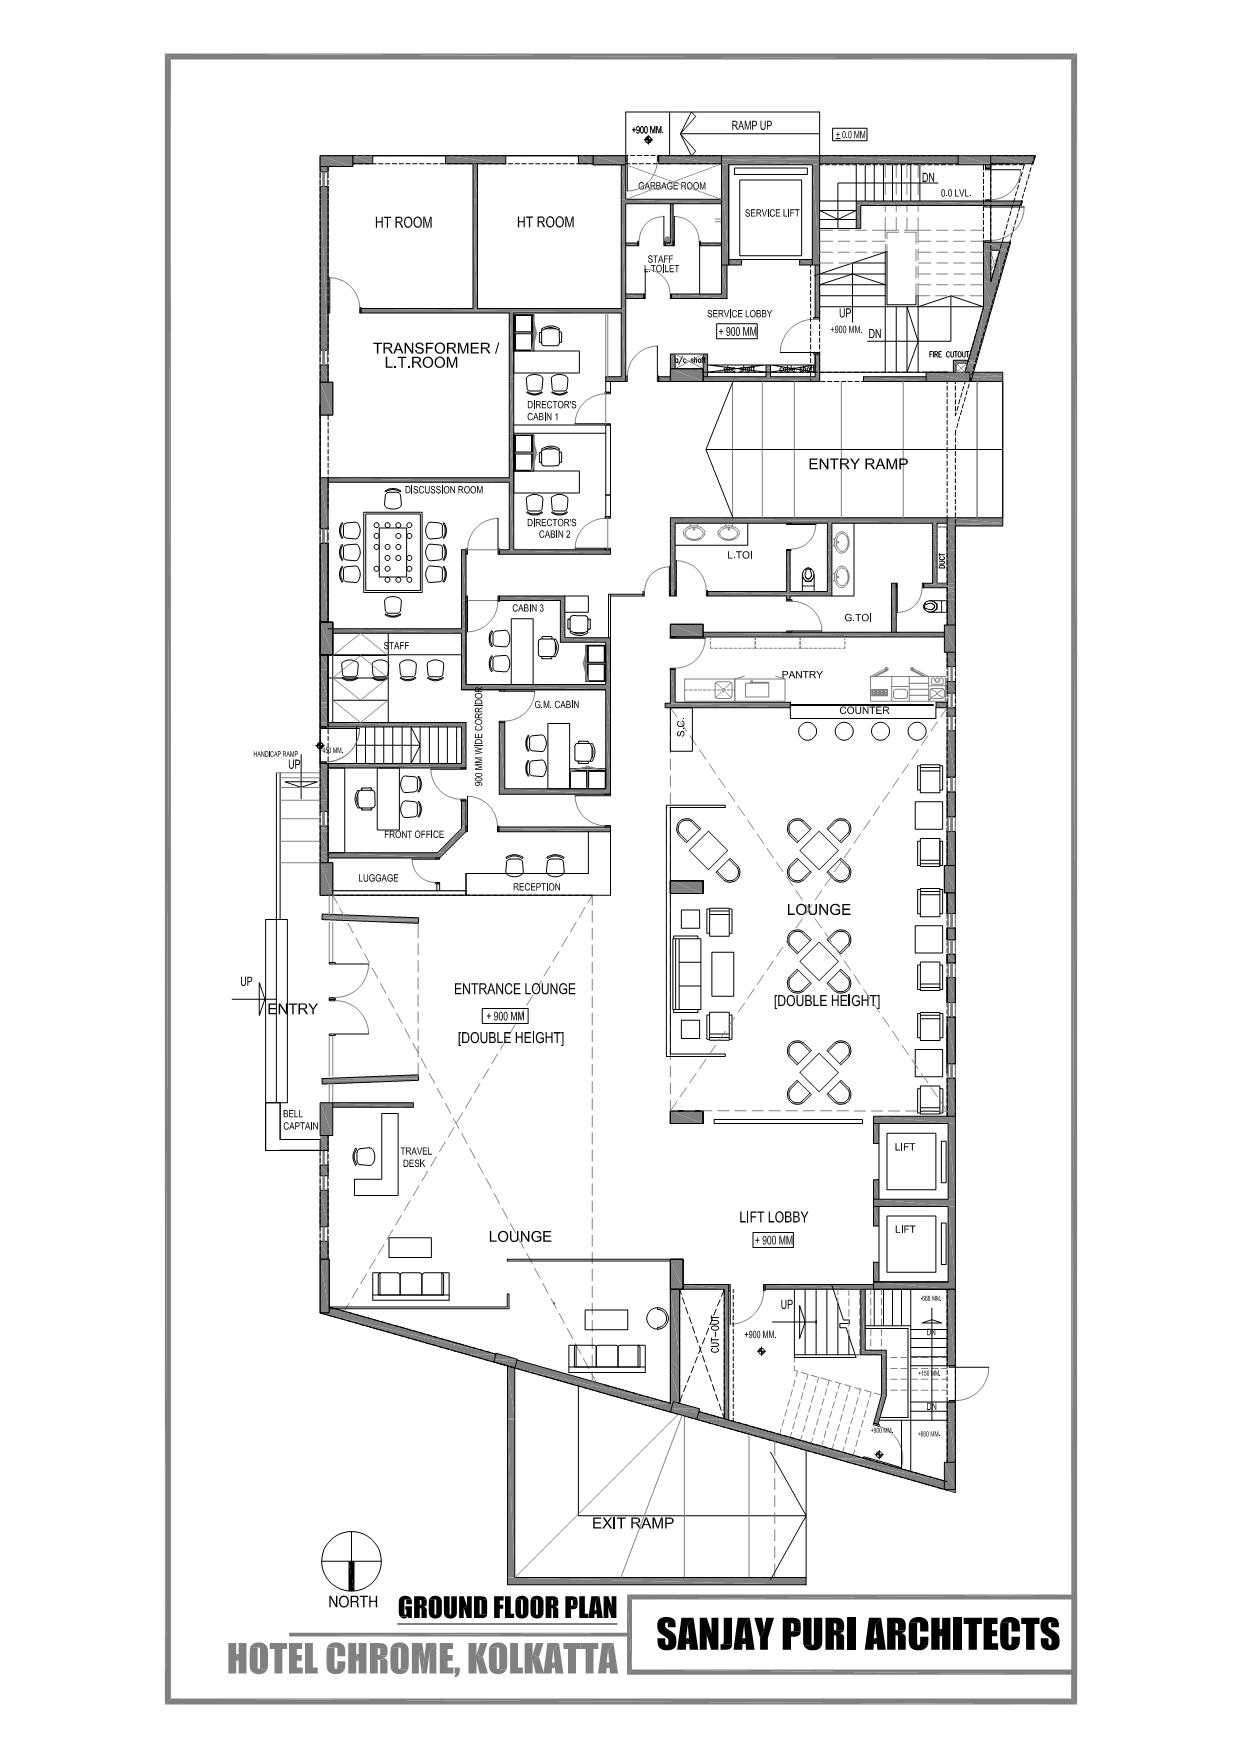 Hotel Ground Floor Plan images